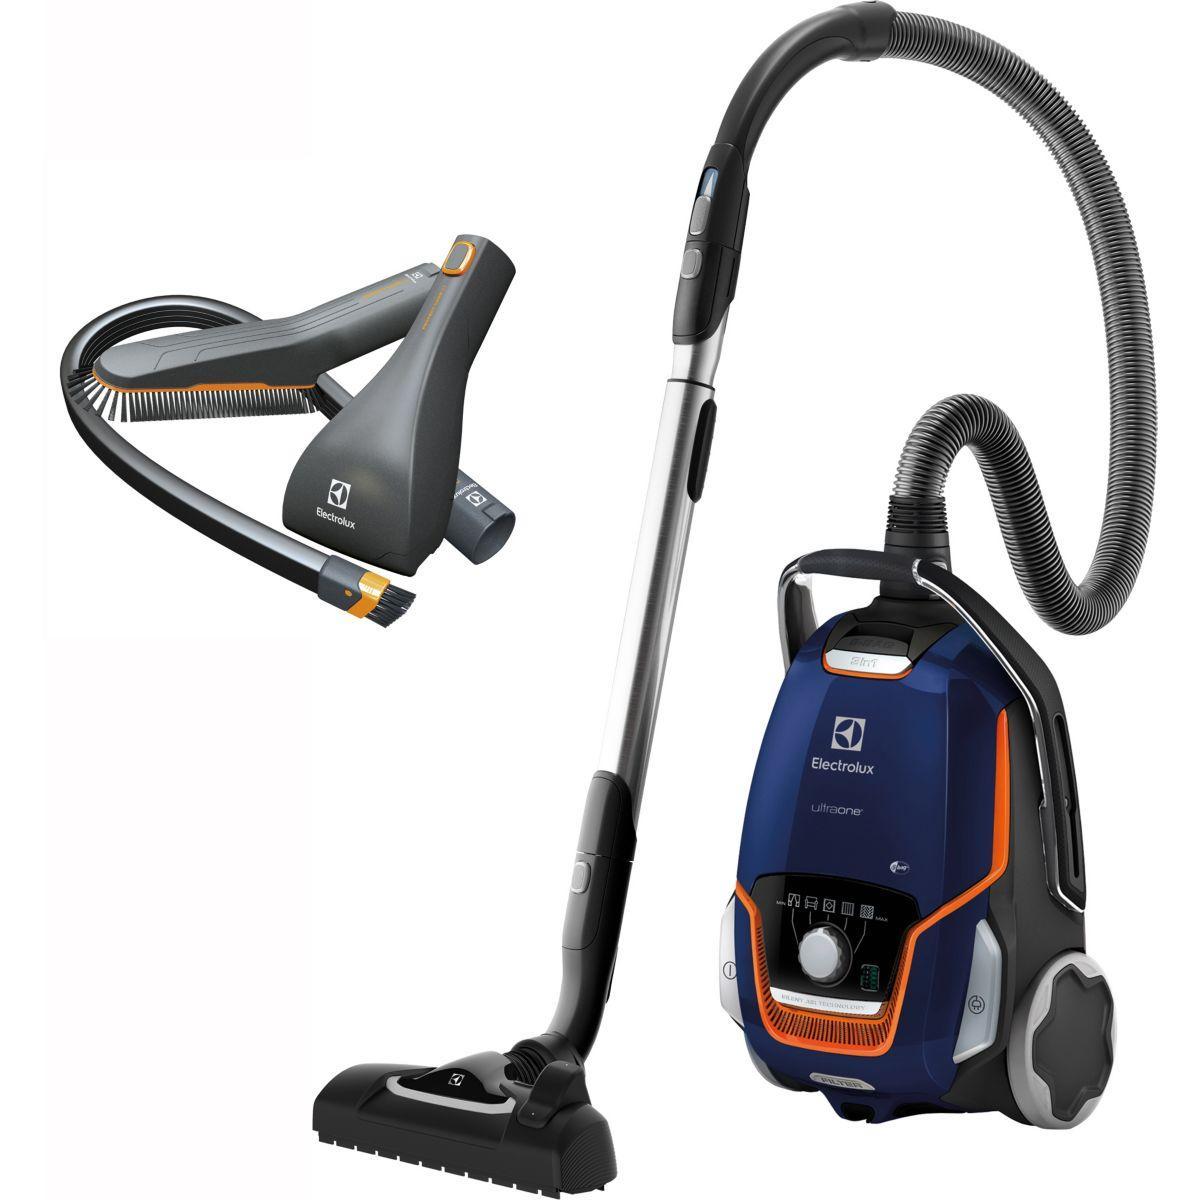 Aspirateur avec sac electrolux ultra one euoc92baut - livraison offerte : code premium